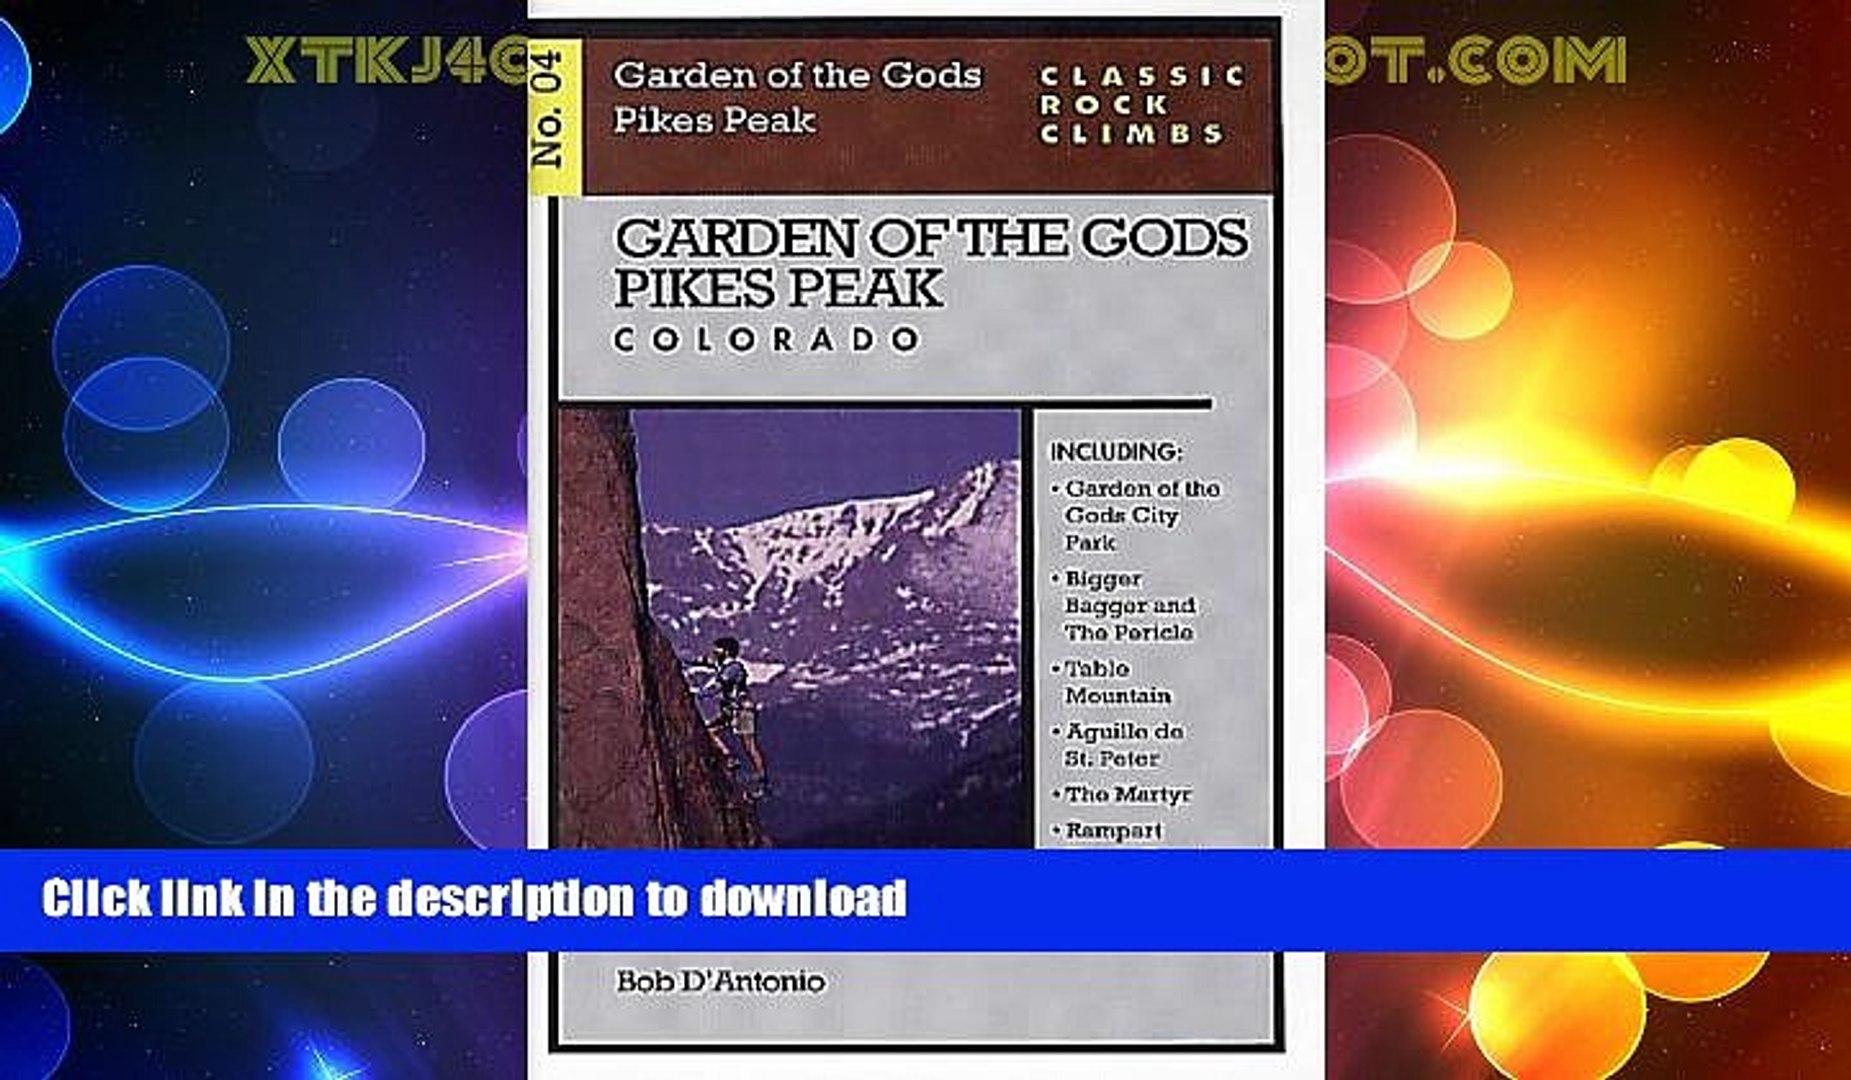 EBOOK ONLINE  Classic Rock Climbs No. 4: Garden of the Gods, Pikes Peak, Colorado FULL ONLINE